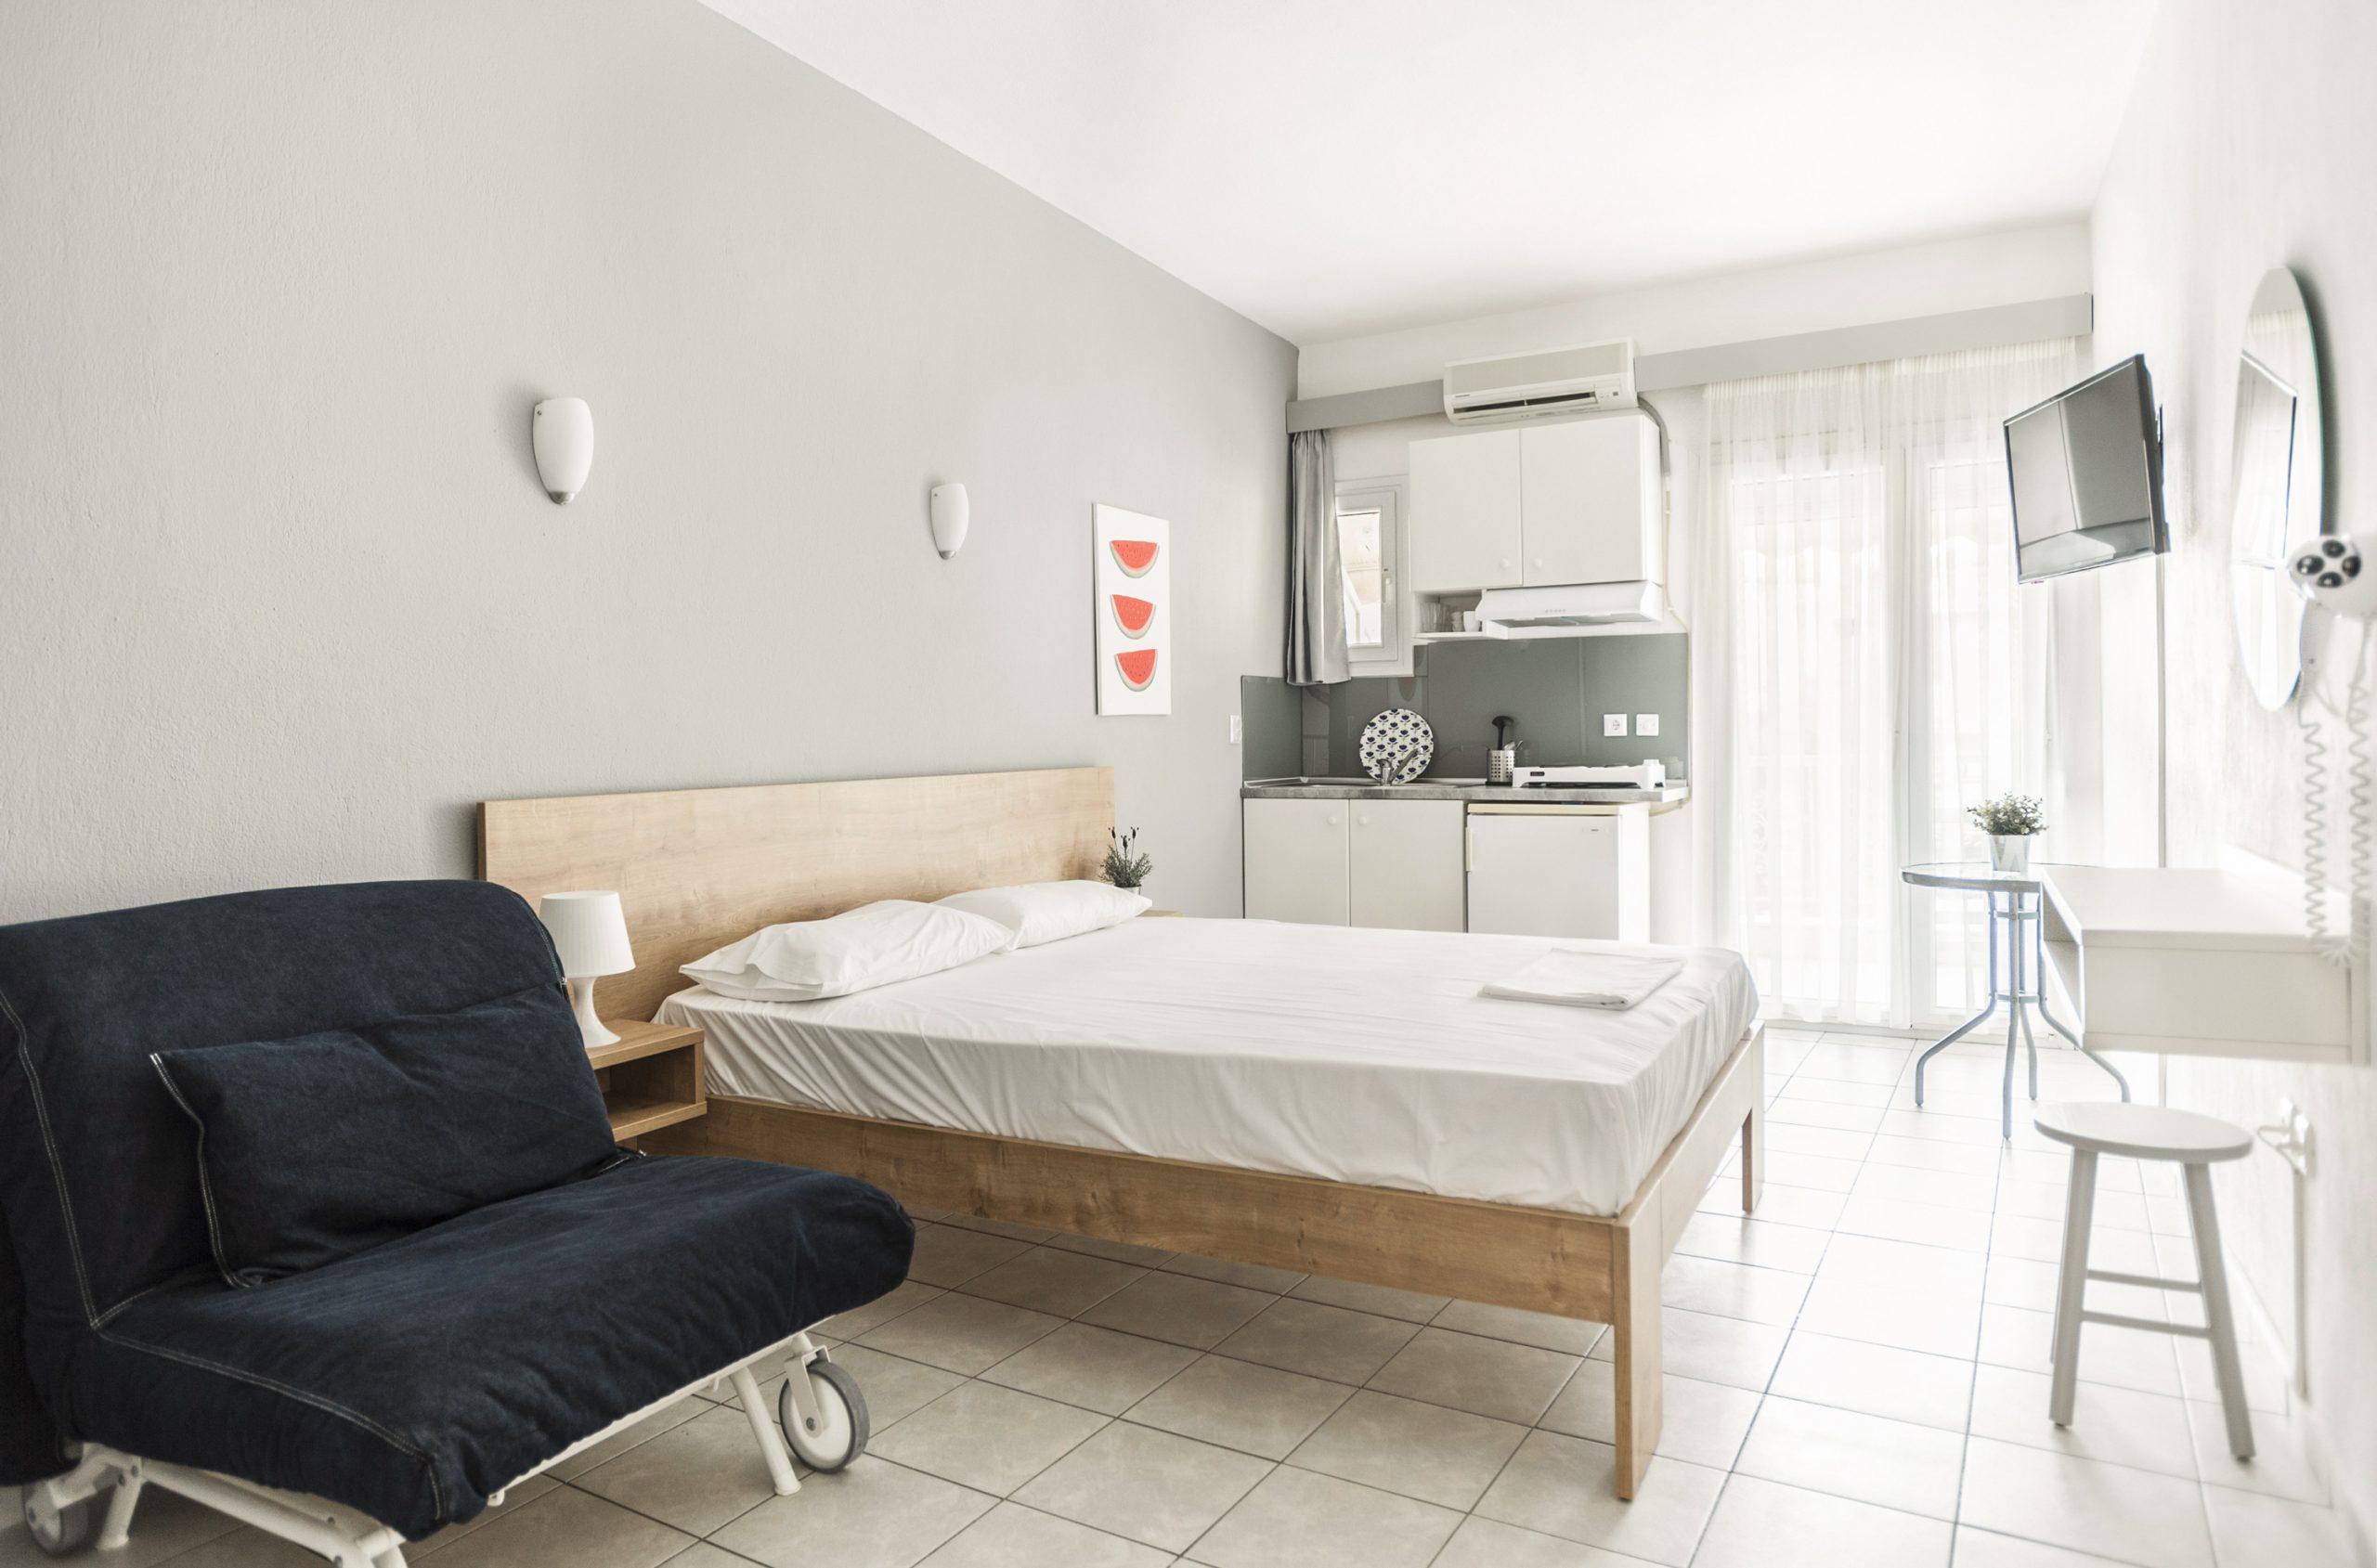 Afkos_rooms_001-3